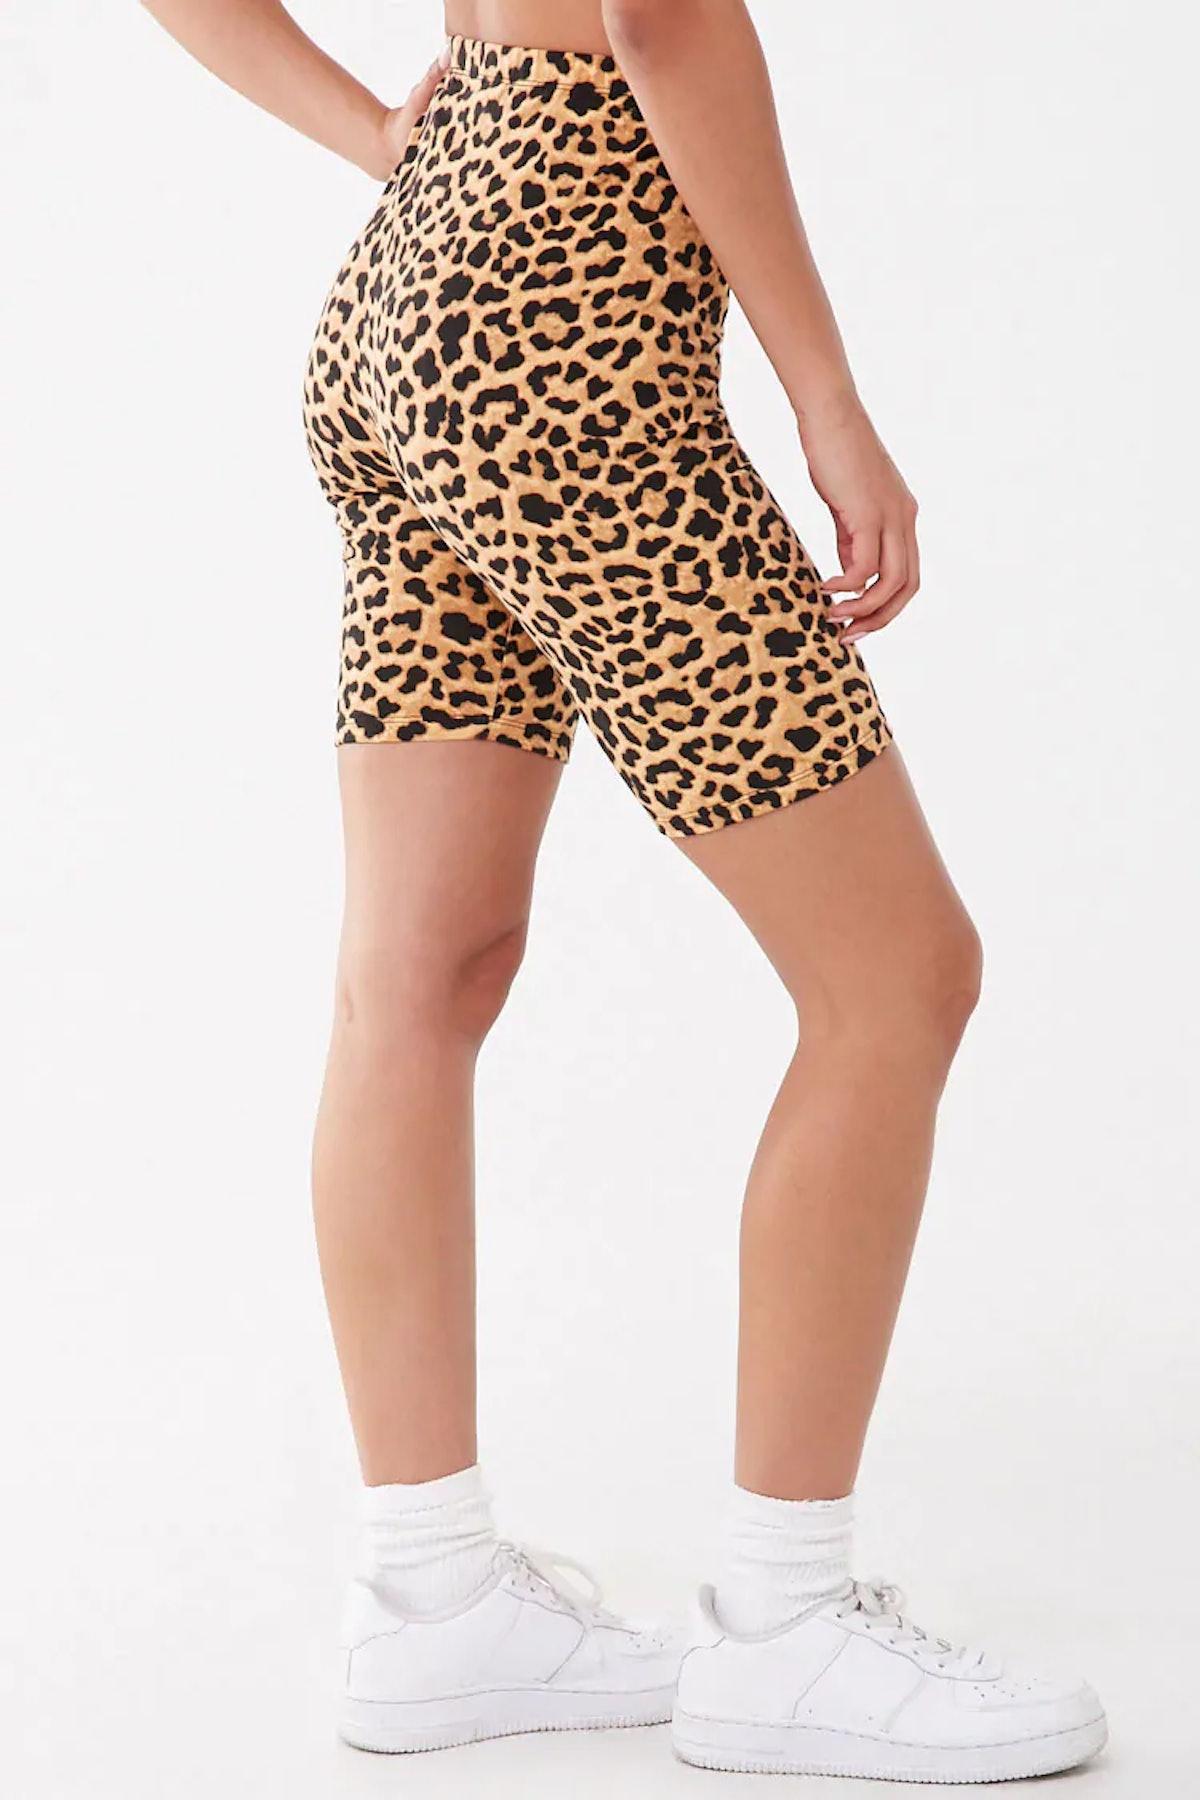 Baby Phat Leopard Print Biker Shorts